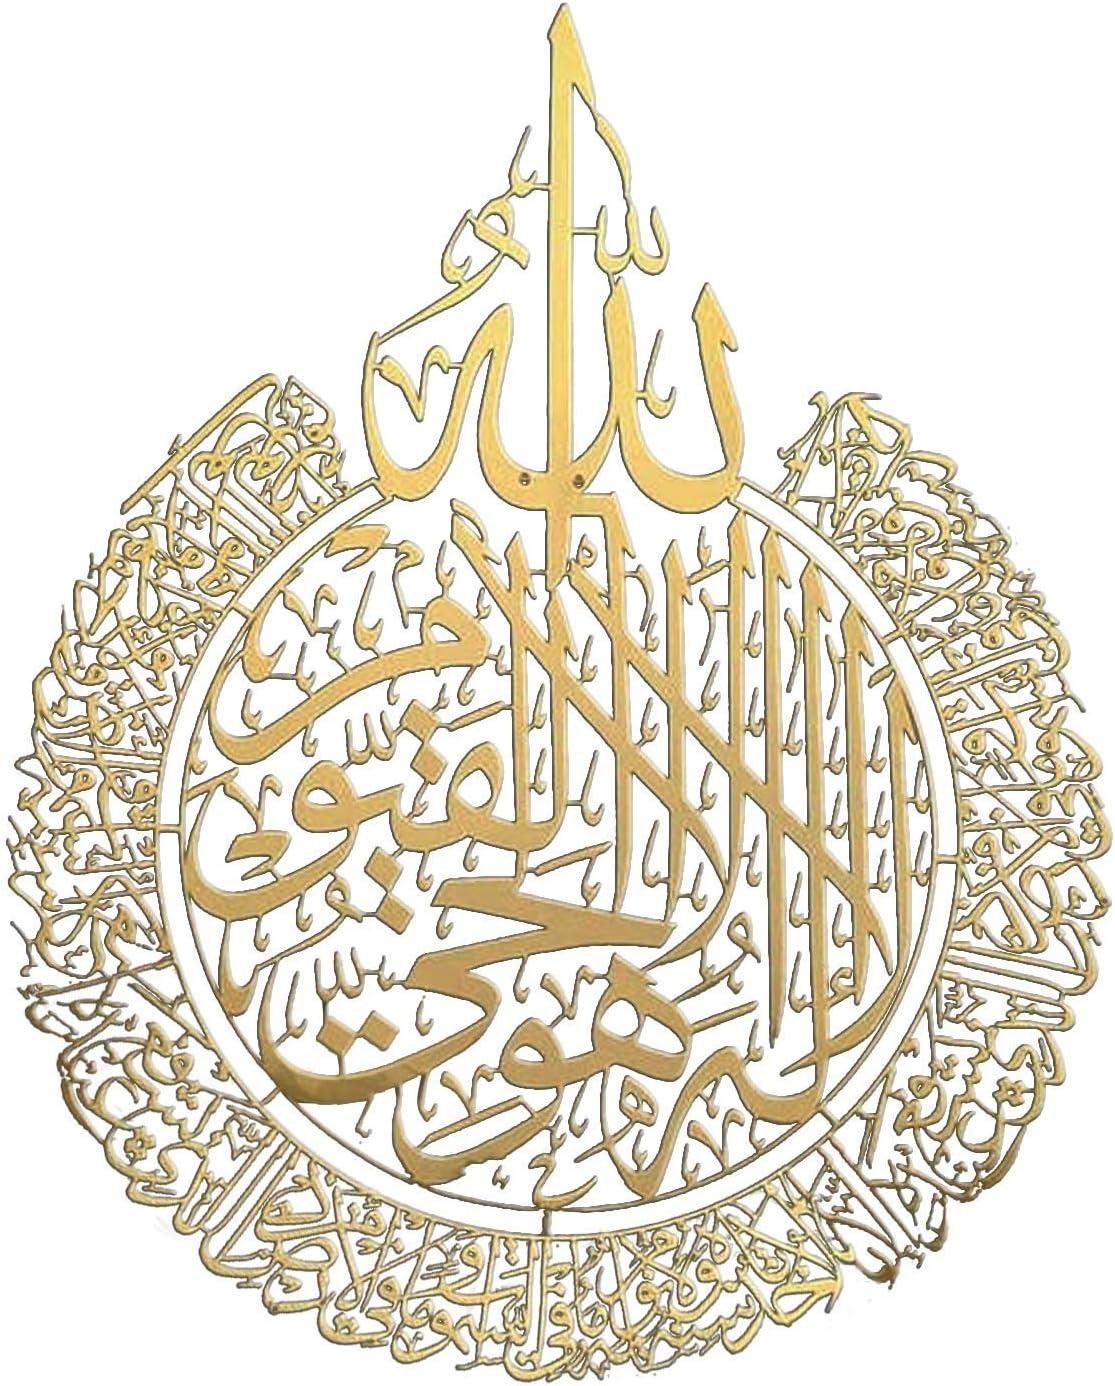 2021 Islamic Wall Art Decor - Ayatul Kursi Shiny Polished Metal Wall Decor, Islamic Calligraphy Decoration, Ramadan Decor, Islamic Wall Decor Home Decor Gift for Muslims 12Inches (Gold)